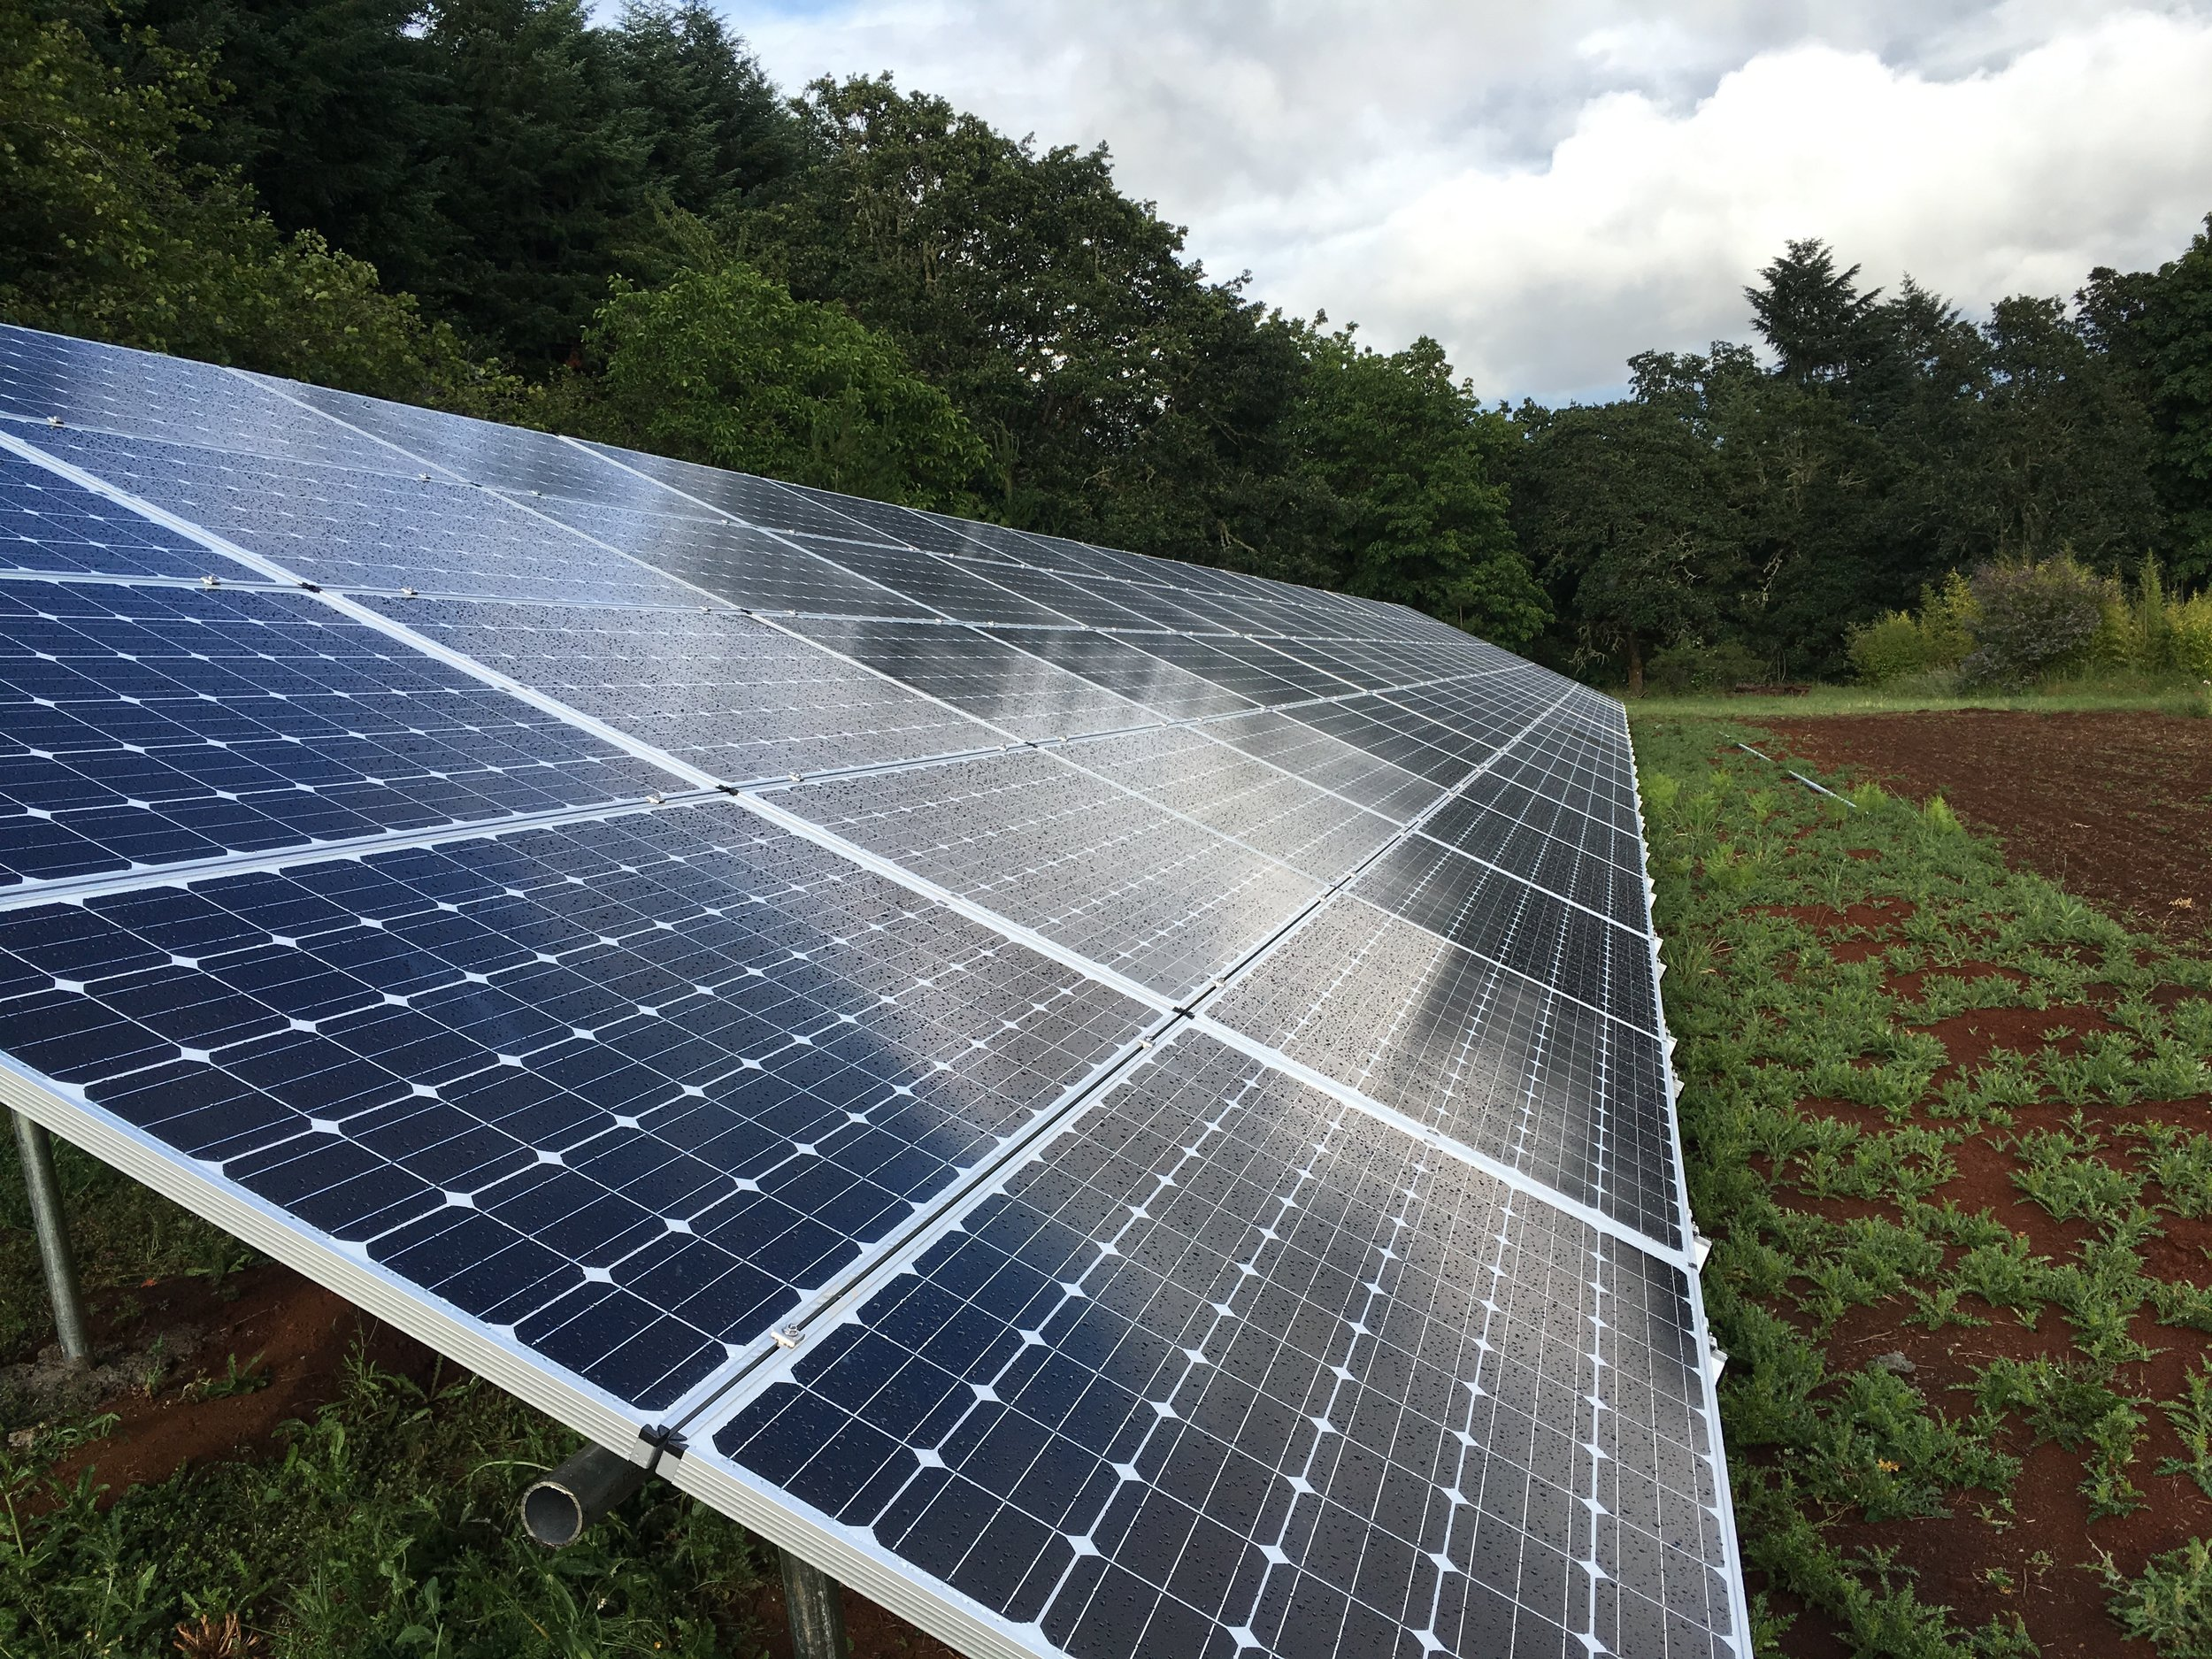 Elemental Energy - Log Homes Store Vineyard - 31kW ground-mounted Solar PV System